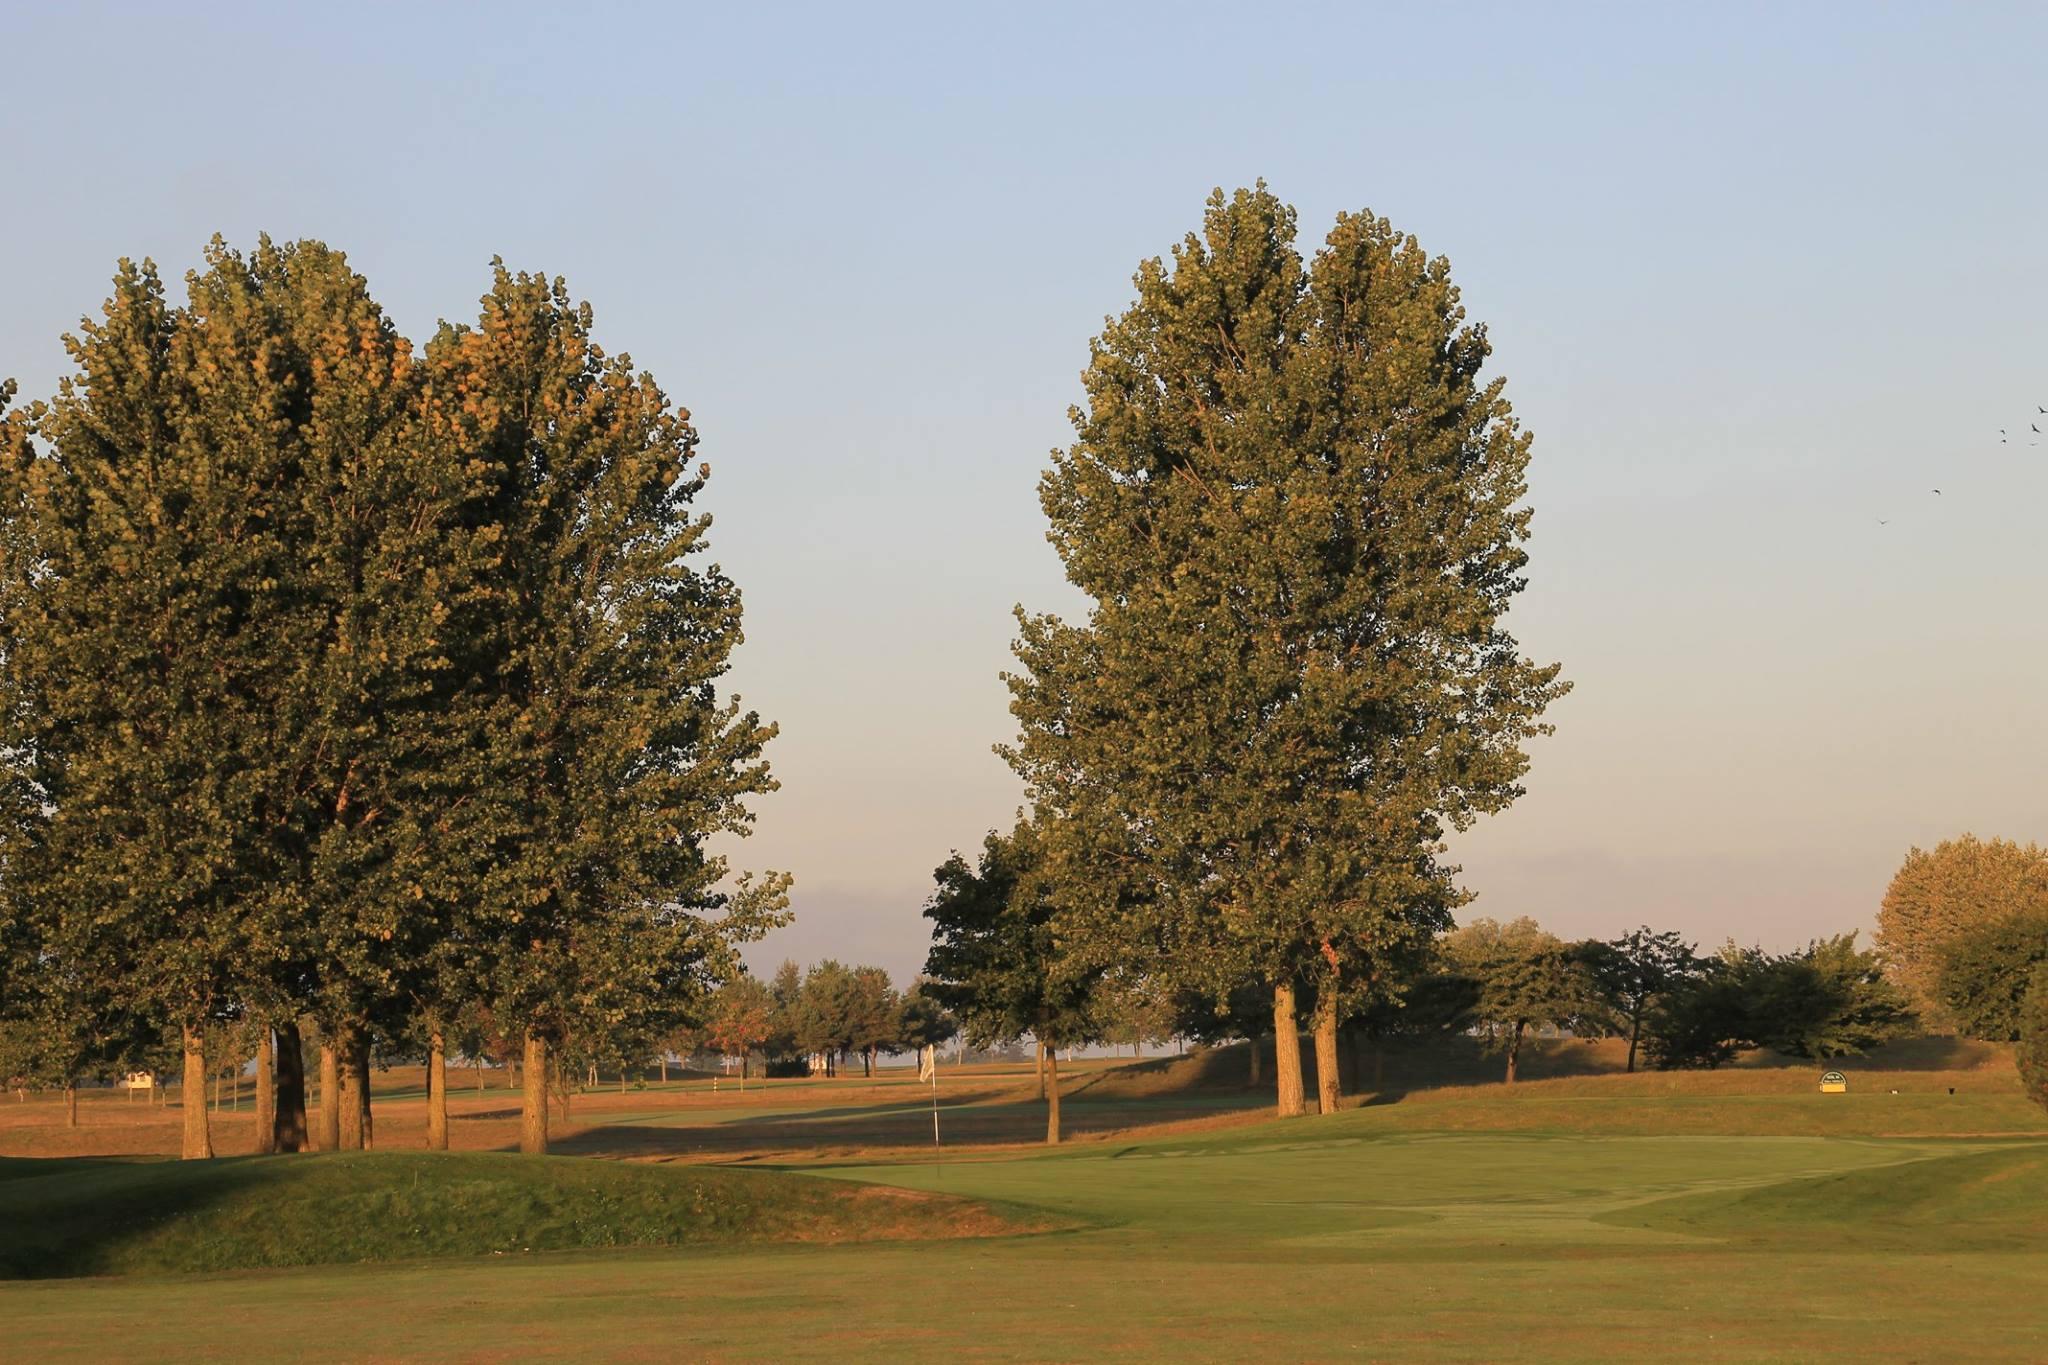 Overview of golf course named Bedinge Golfklubb